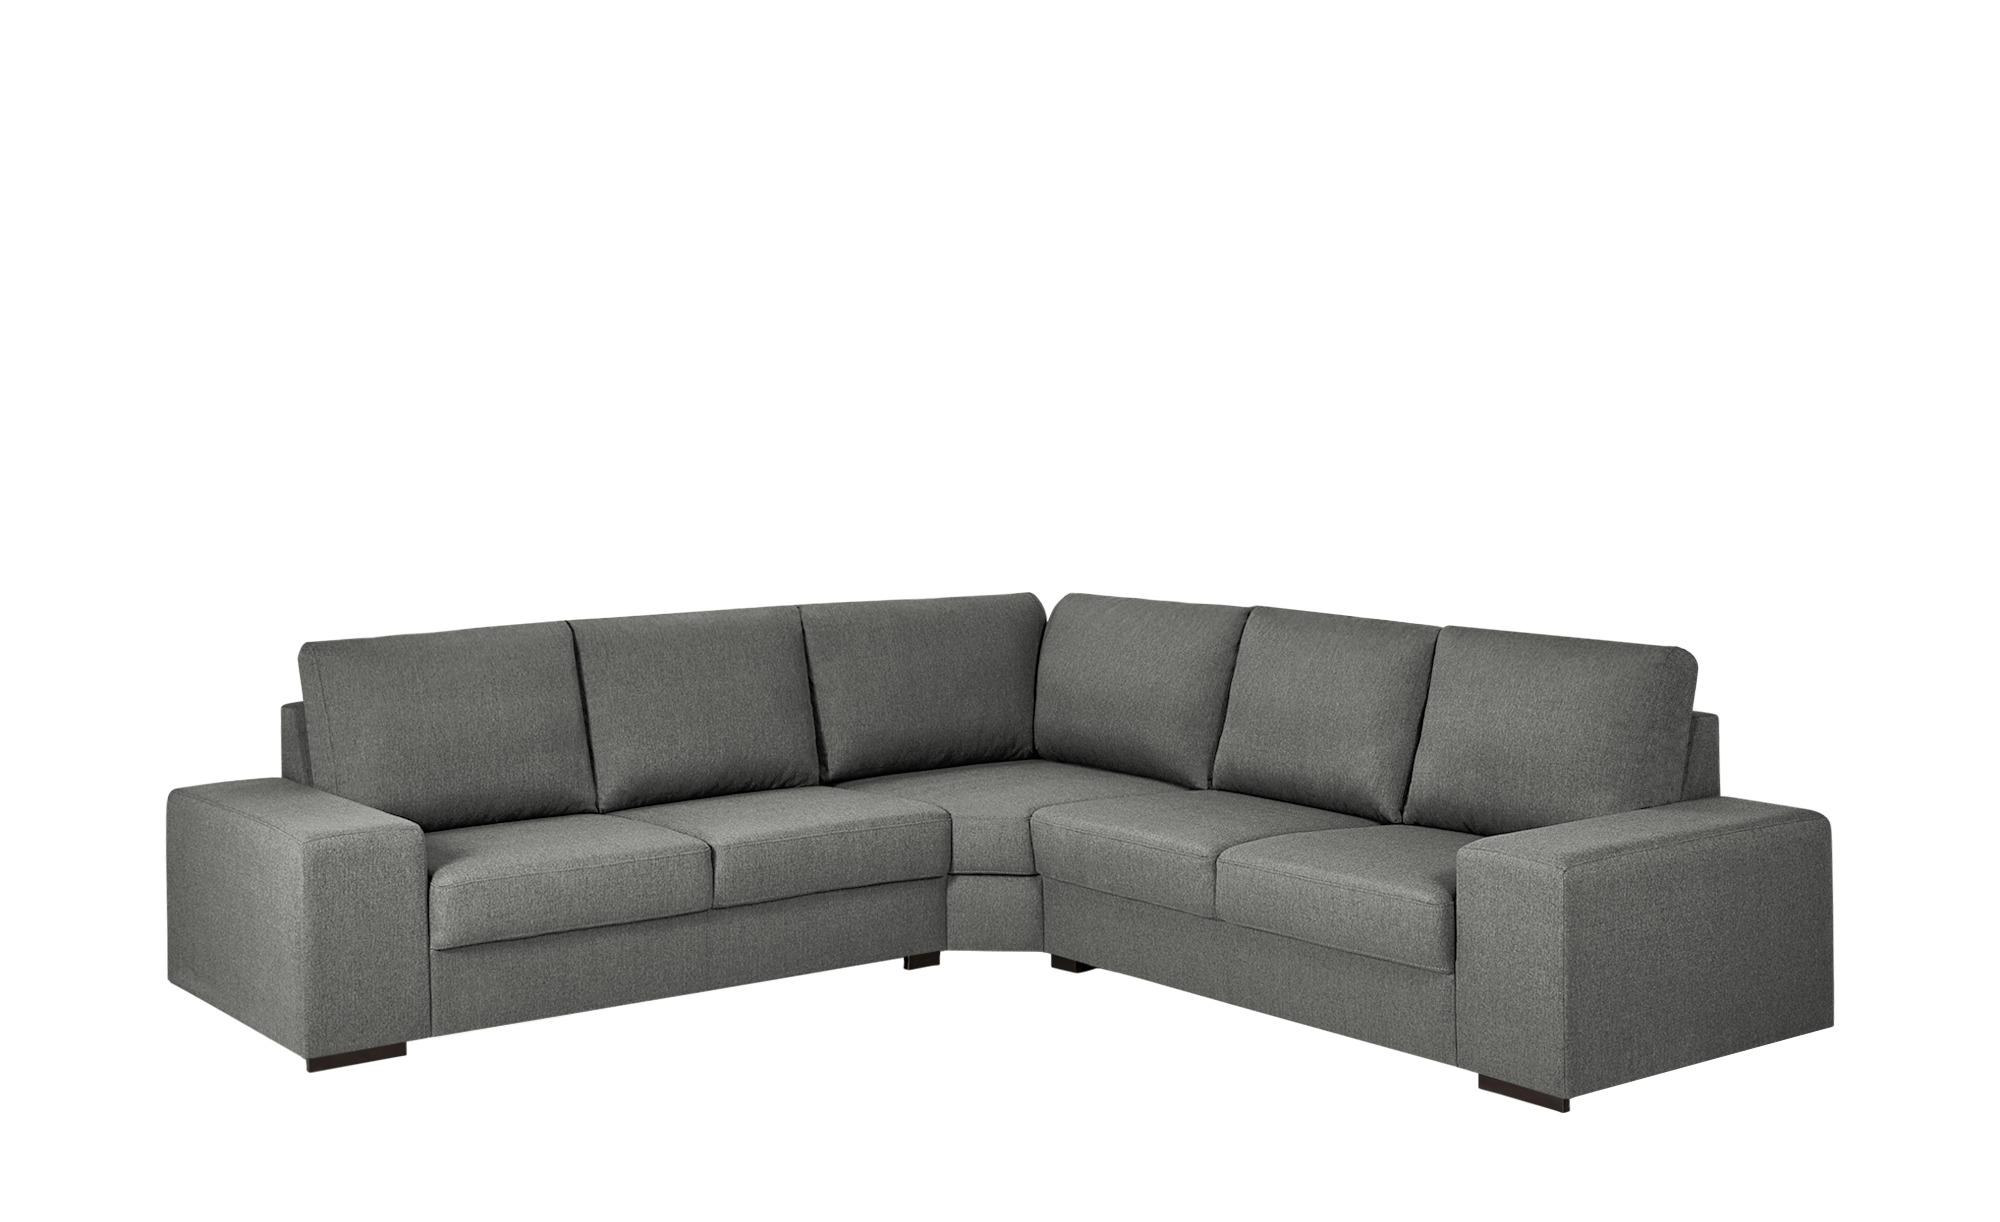 Ecksofa - grau - 90 cm - Polstermöbel > Sofas > Ecksofas - Möbel Kraft